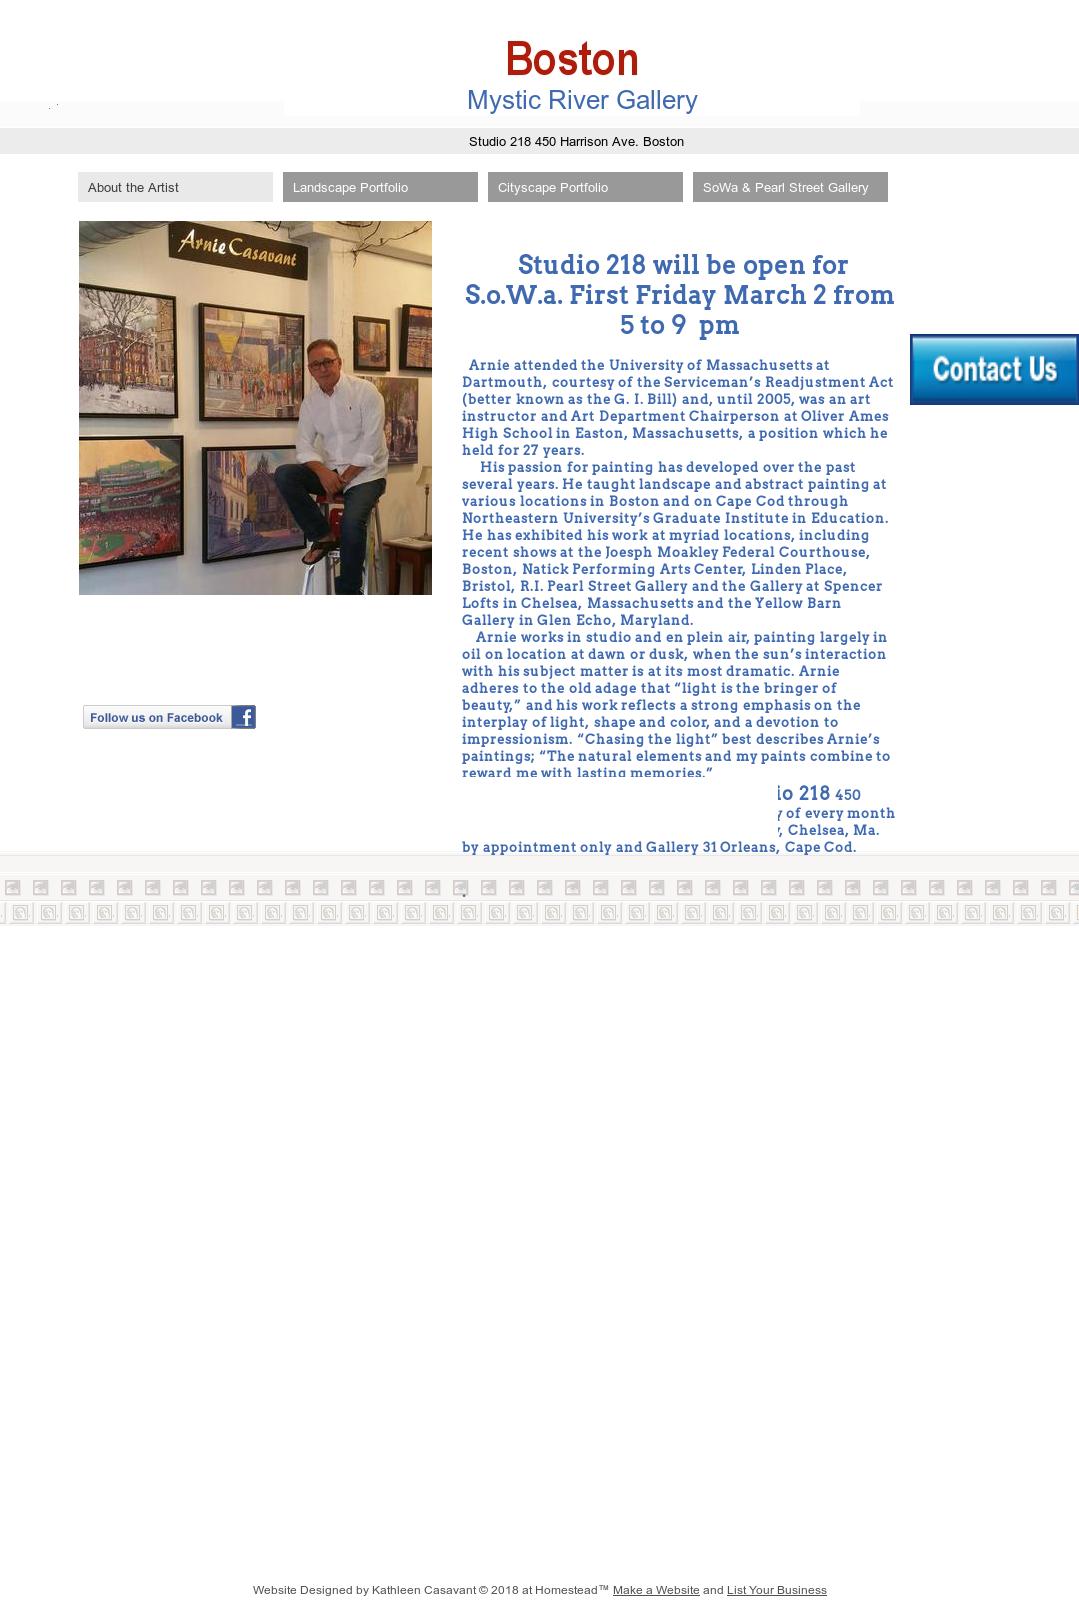 Arnie Casavant Dba Mystic River Gallery Competitors, Revenue